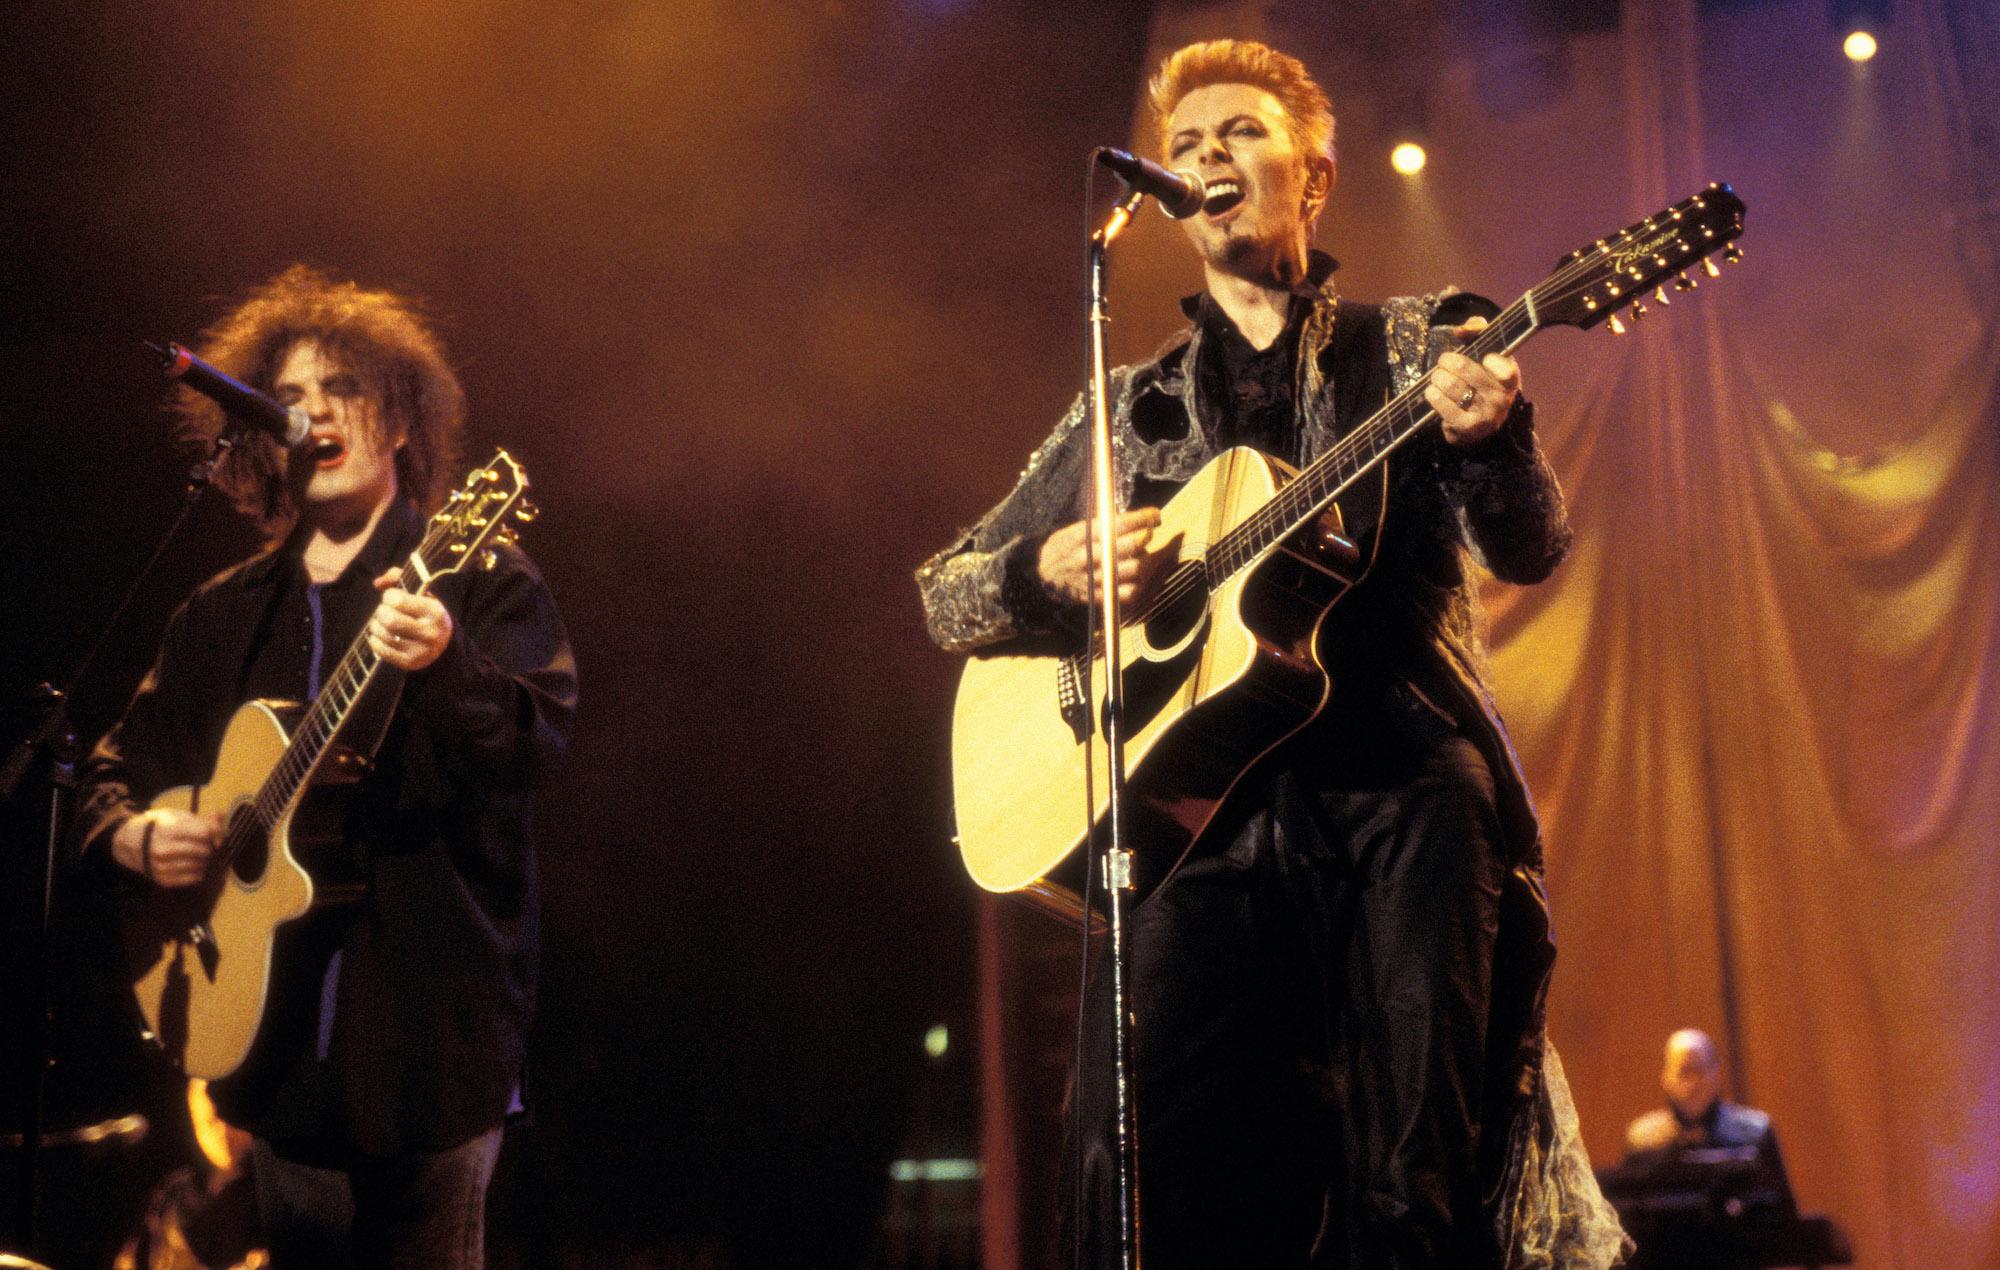 David Bowie Robert Smith 50th birthday